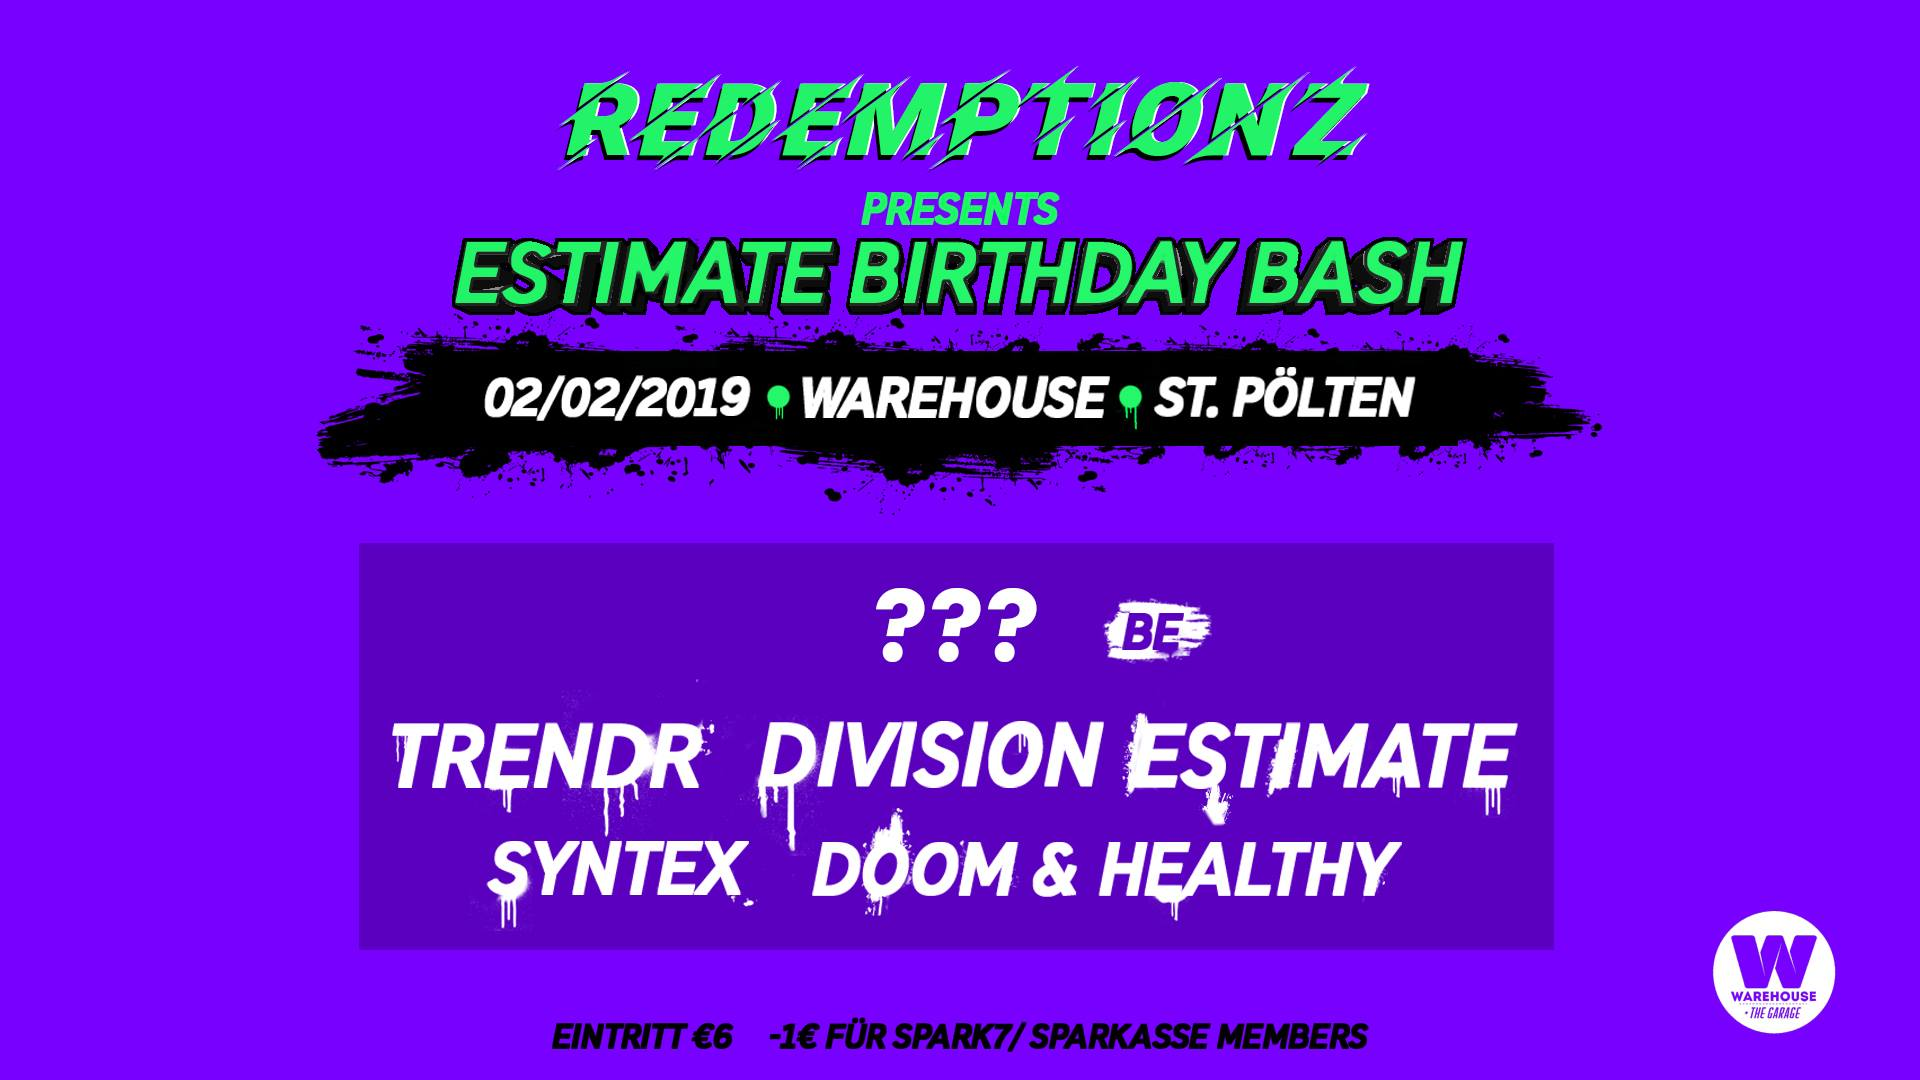 Redemptionz pres. Estimate Birthday Bash